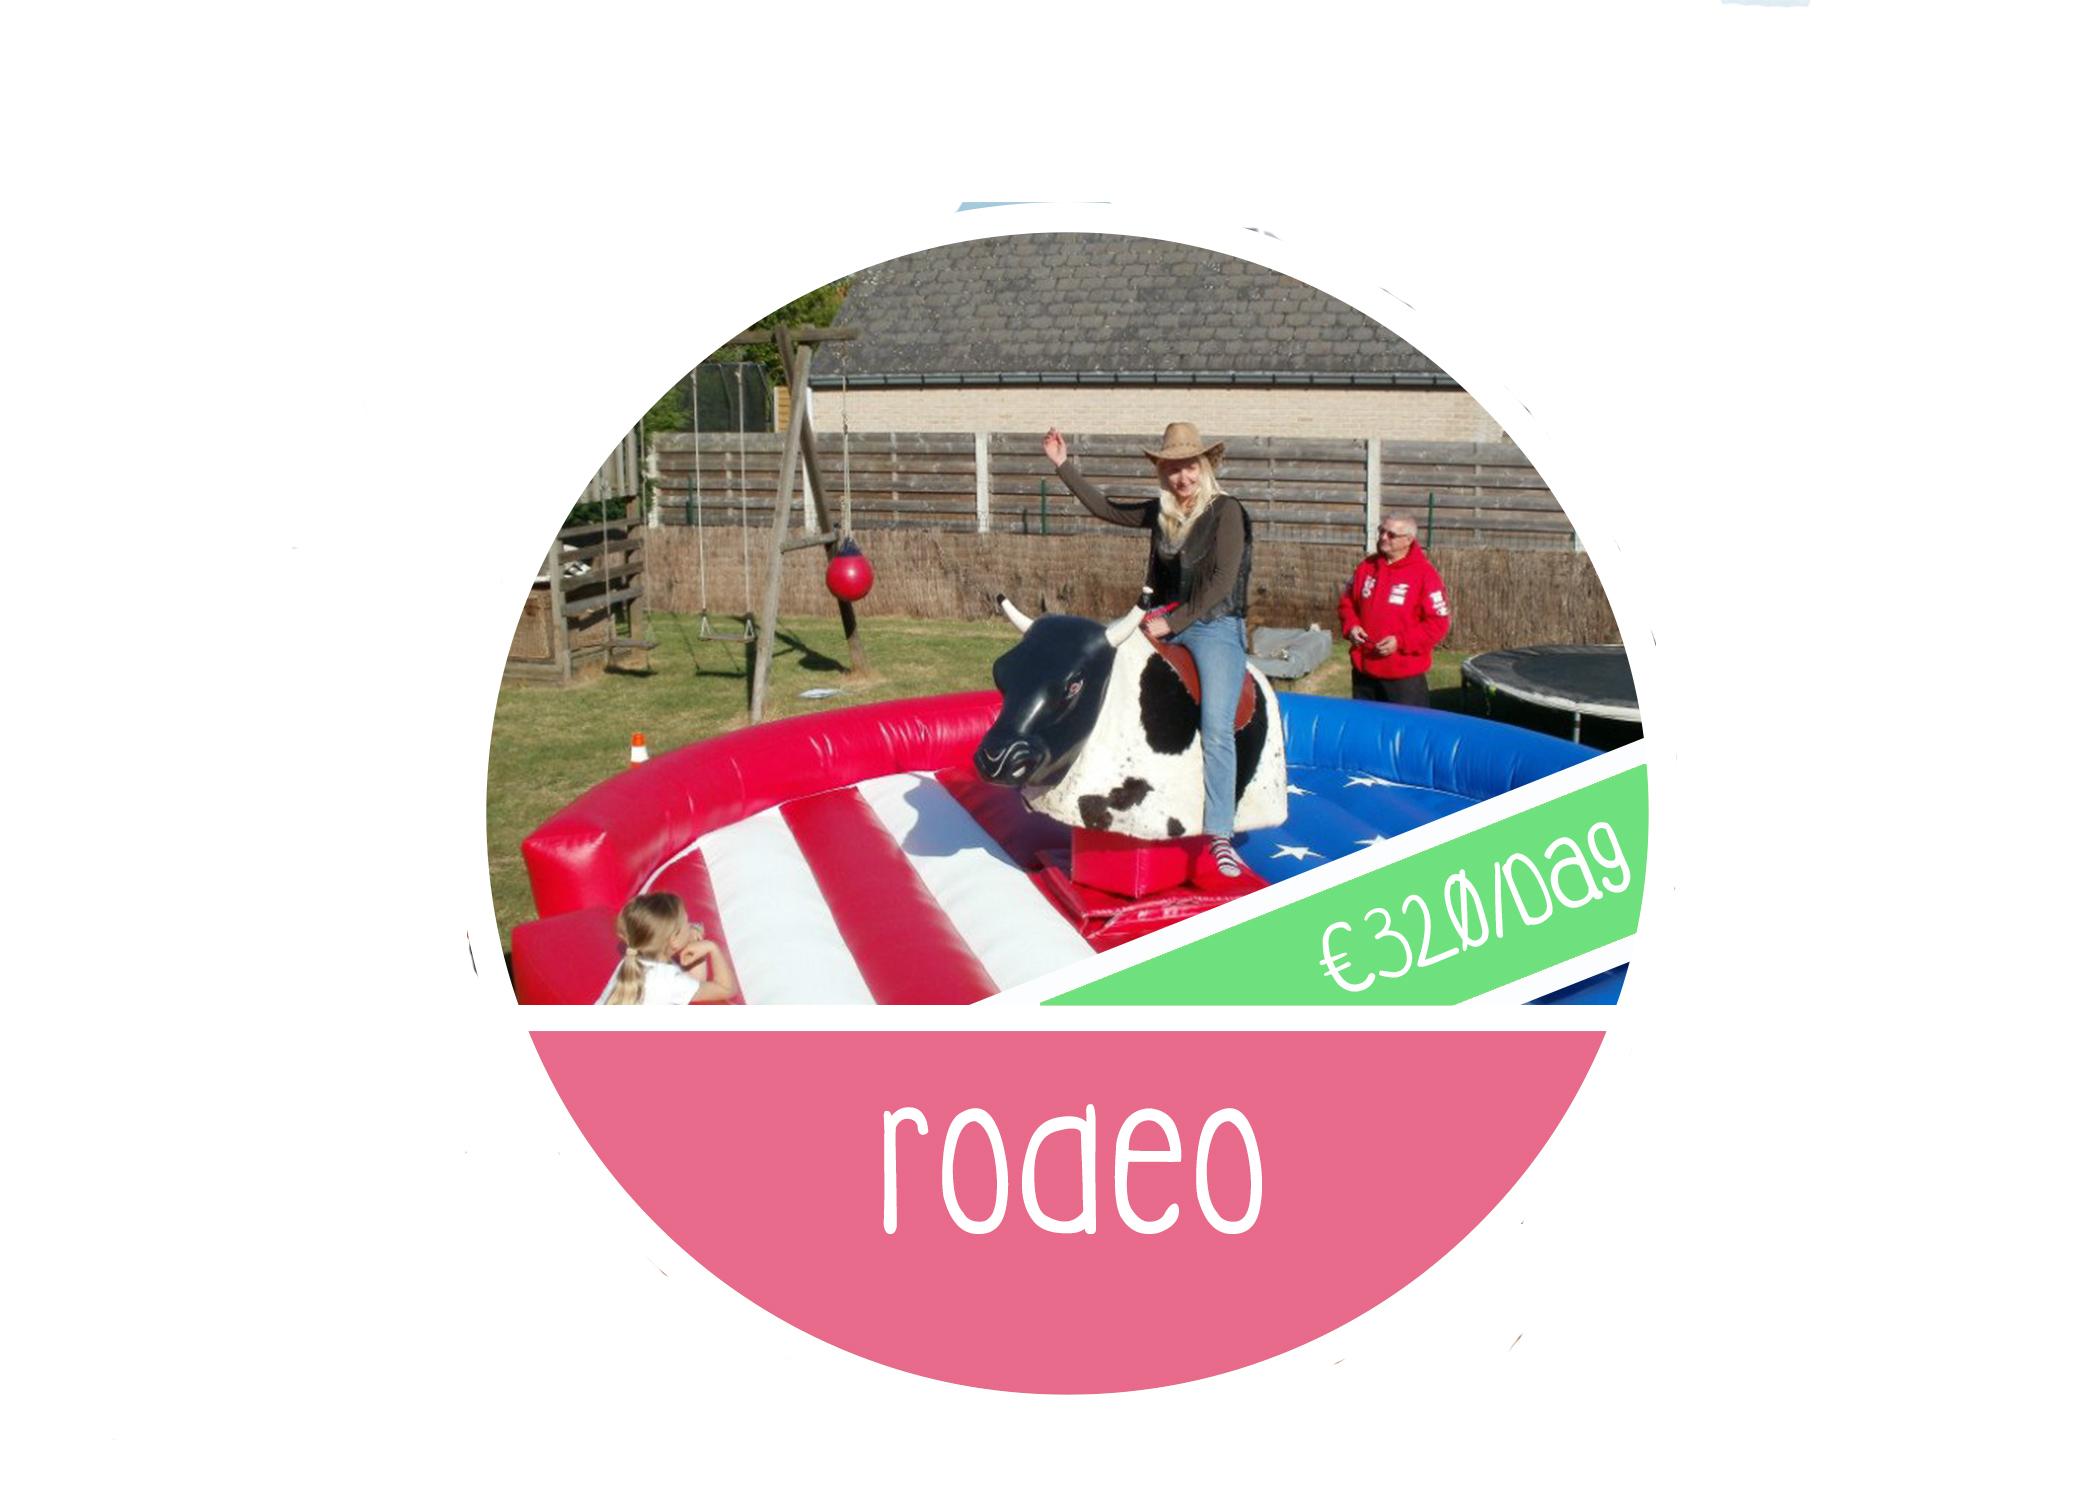 bollen_eventa_rodeo.jpg